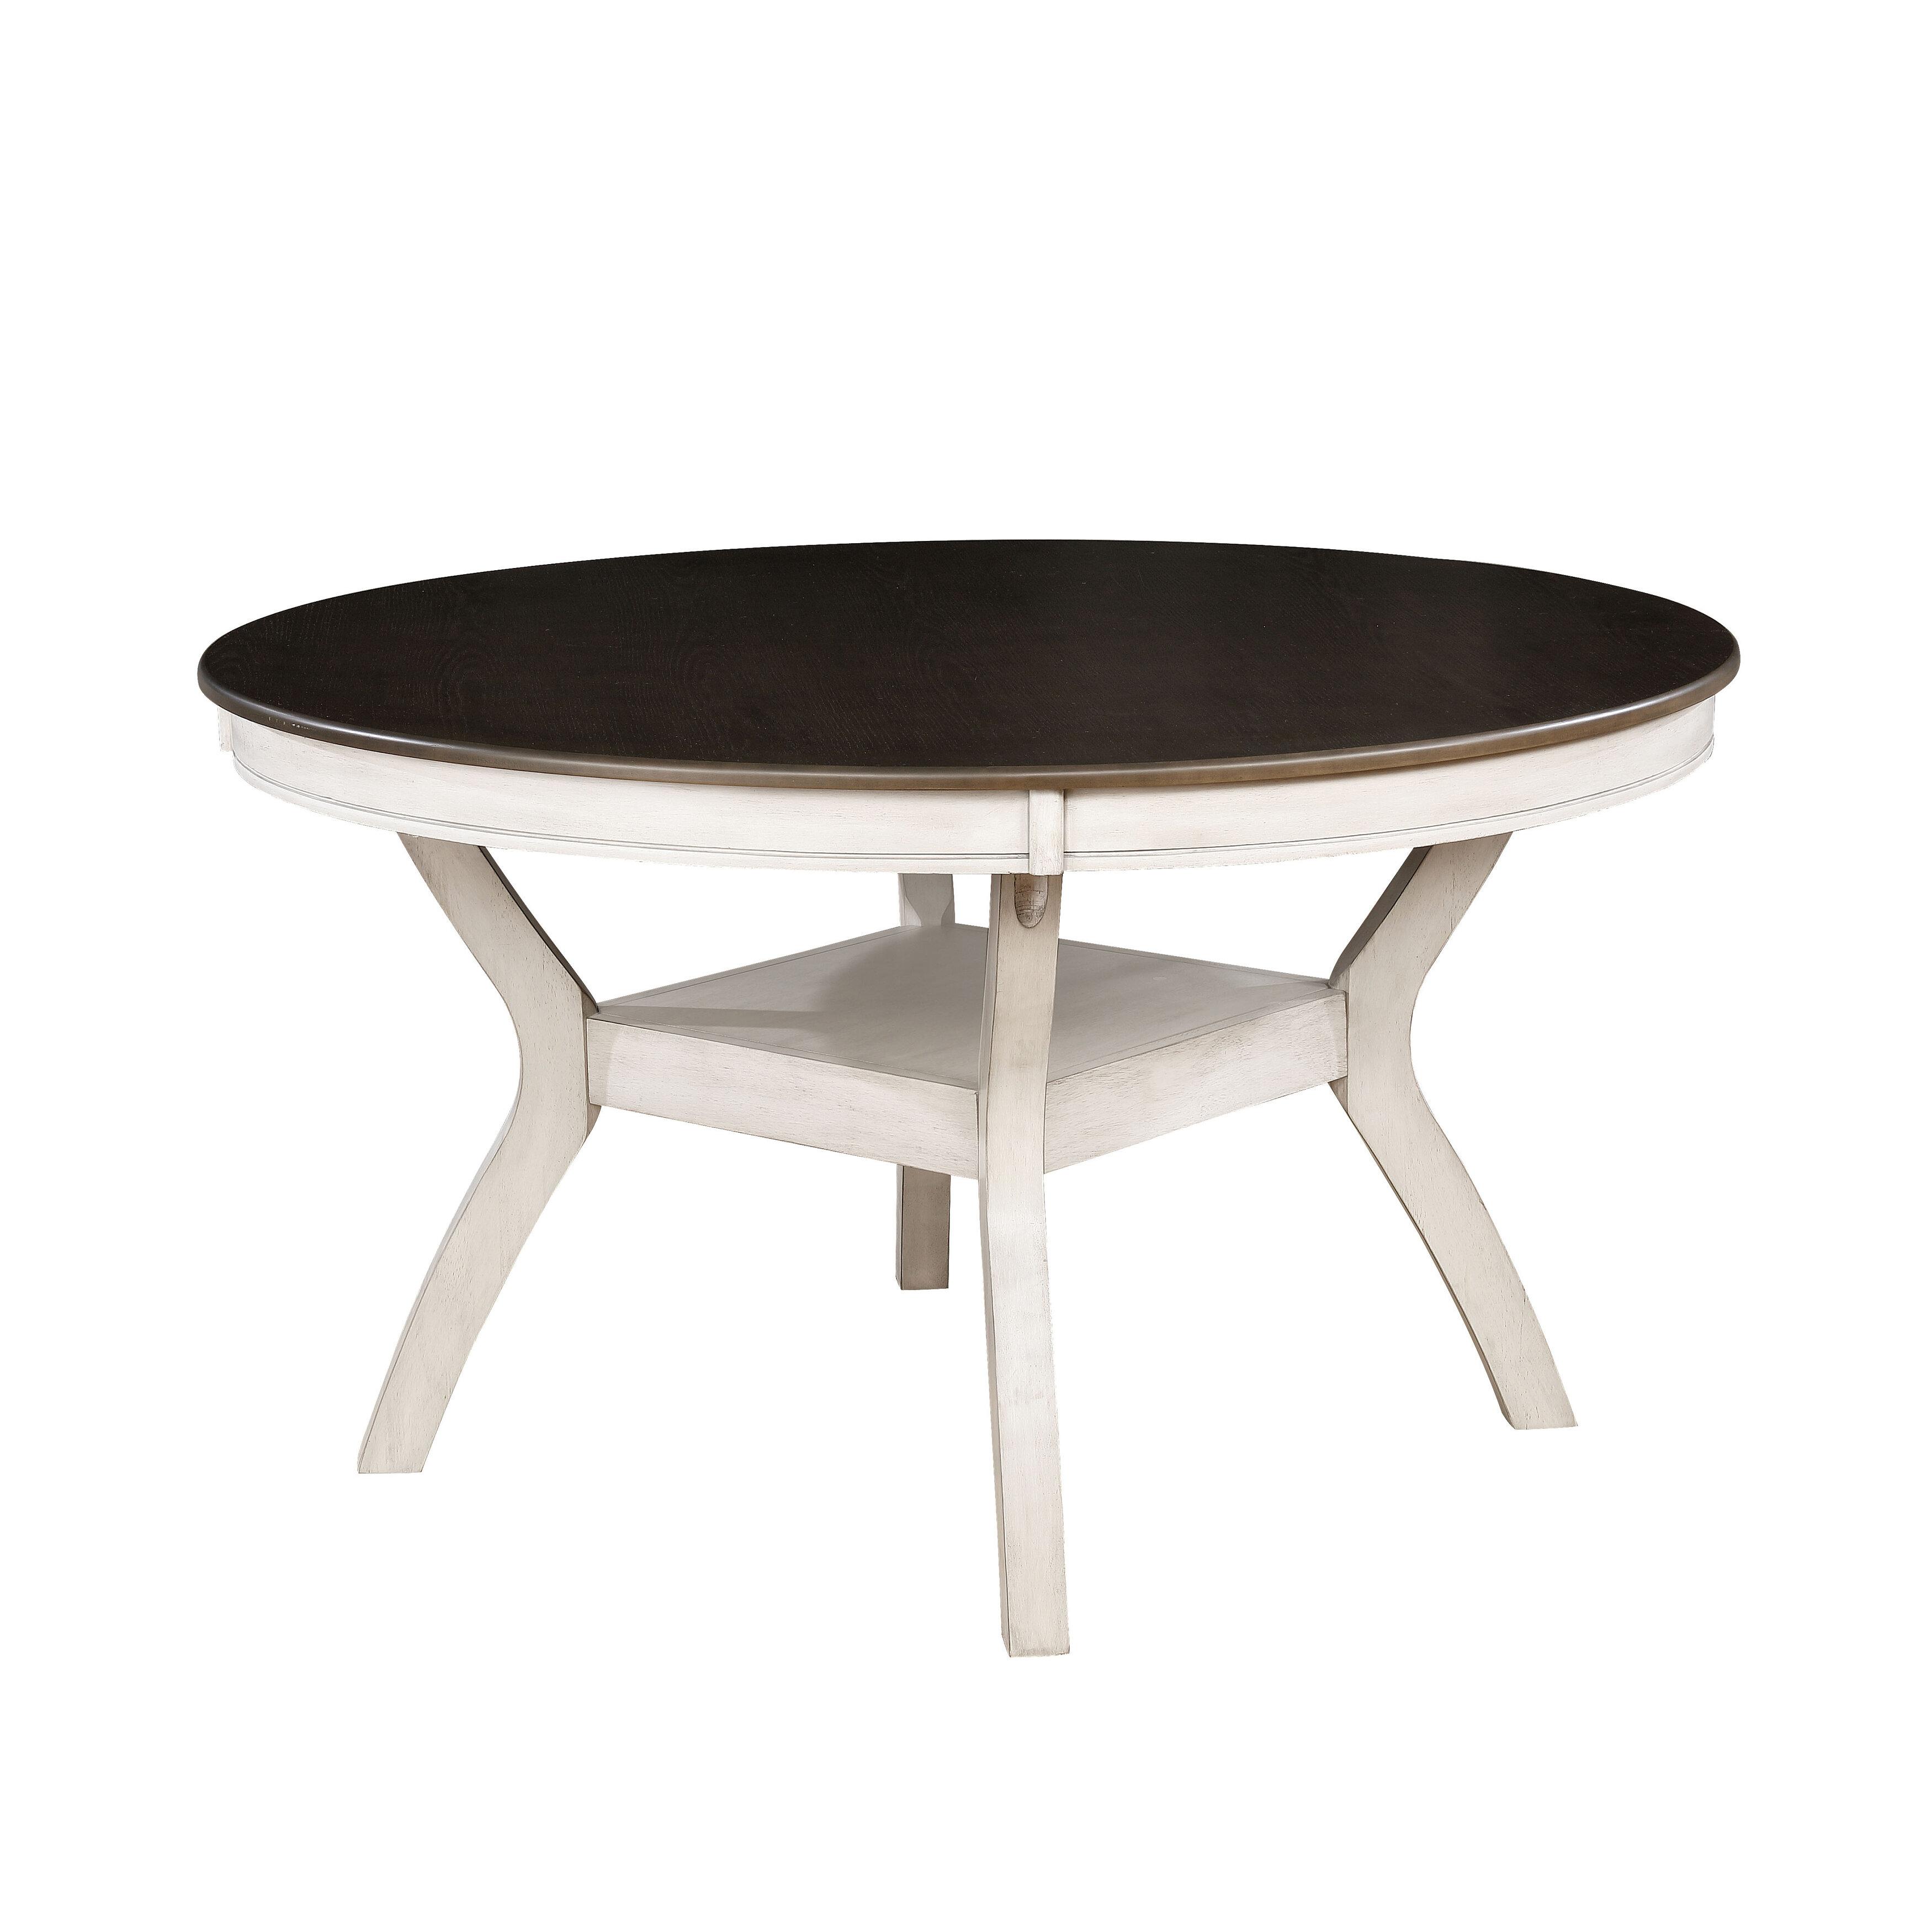 Round Storage Kitchen Dining Tables You Ll Love In 2021 Wayfair